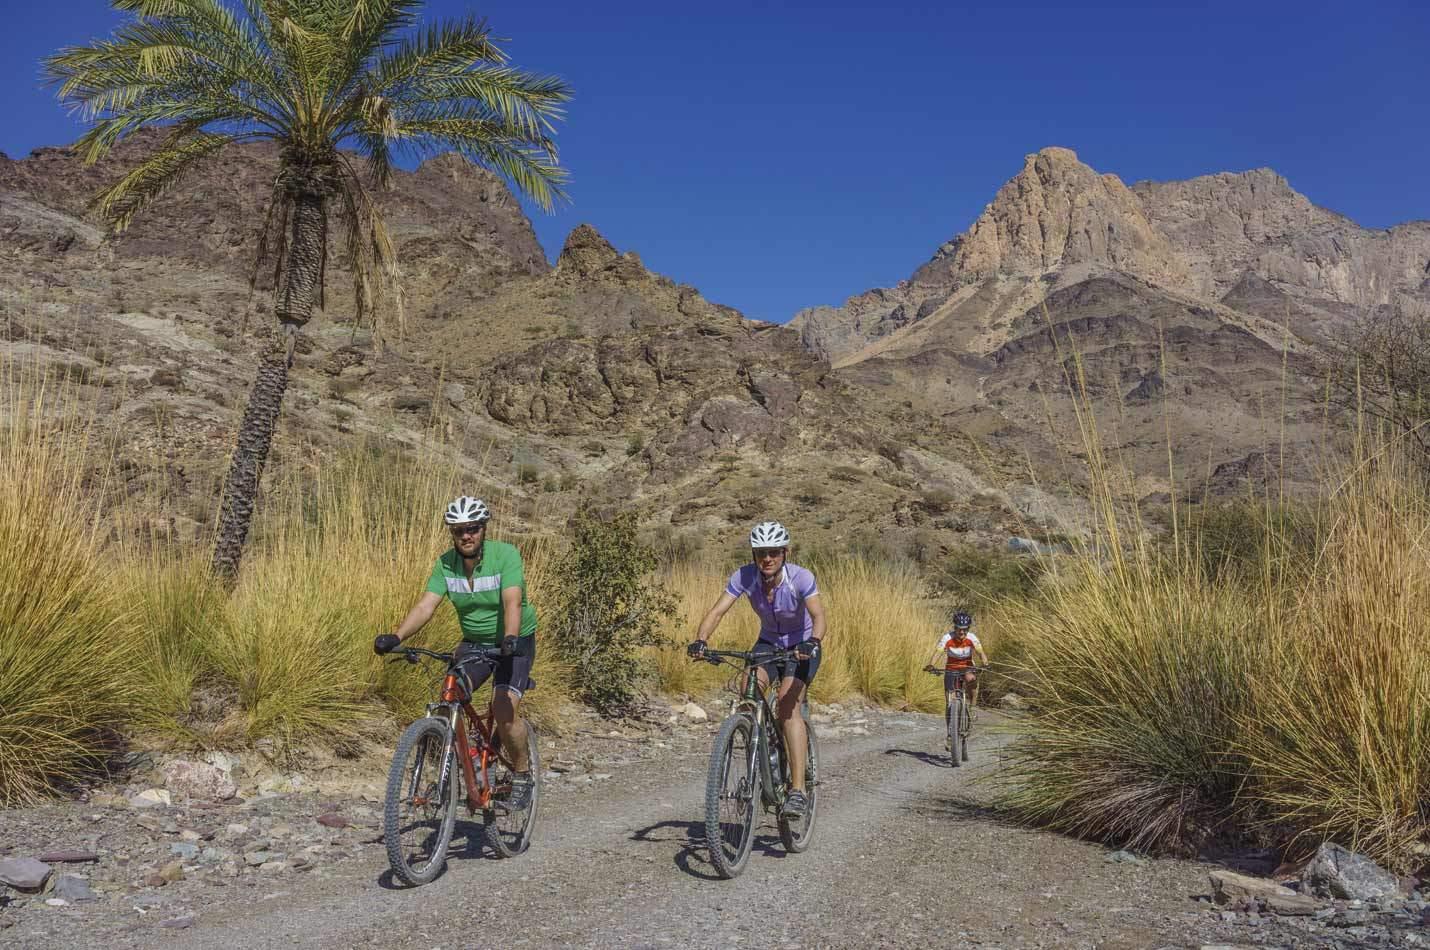 Oman Mountainbike Tour drei Mountainbiker in einem Gebirgswhadi im Oman